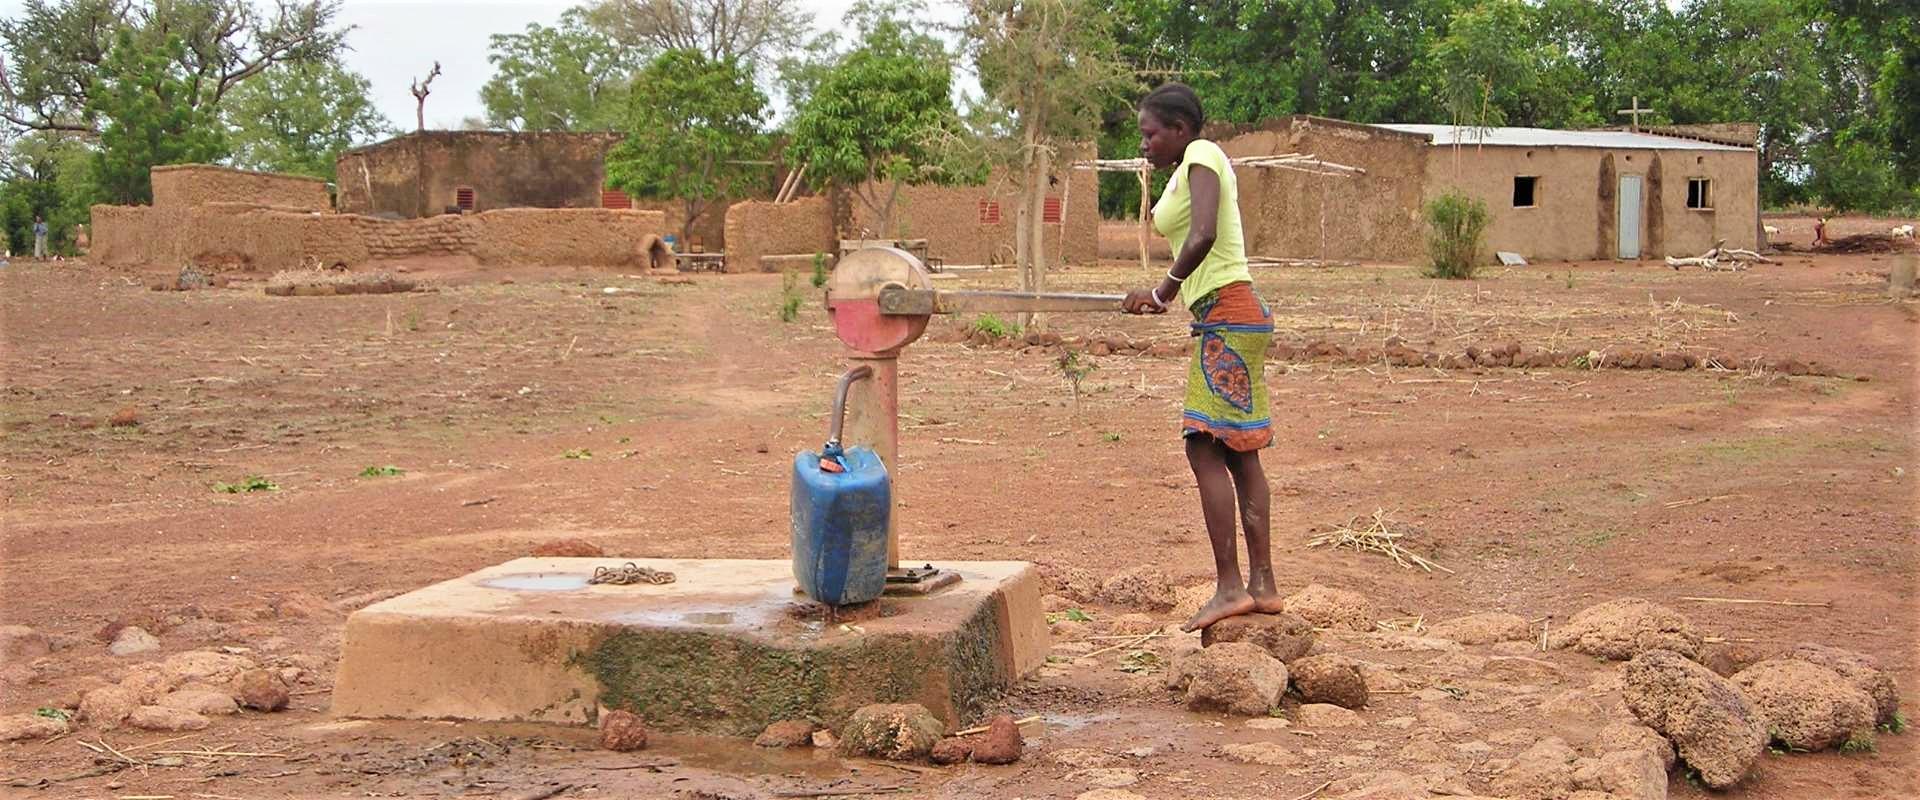 Pozzo_Burkina_Faso_Mani_Tese_2017